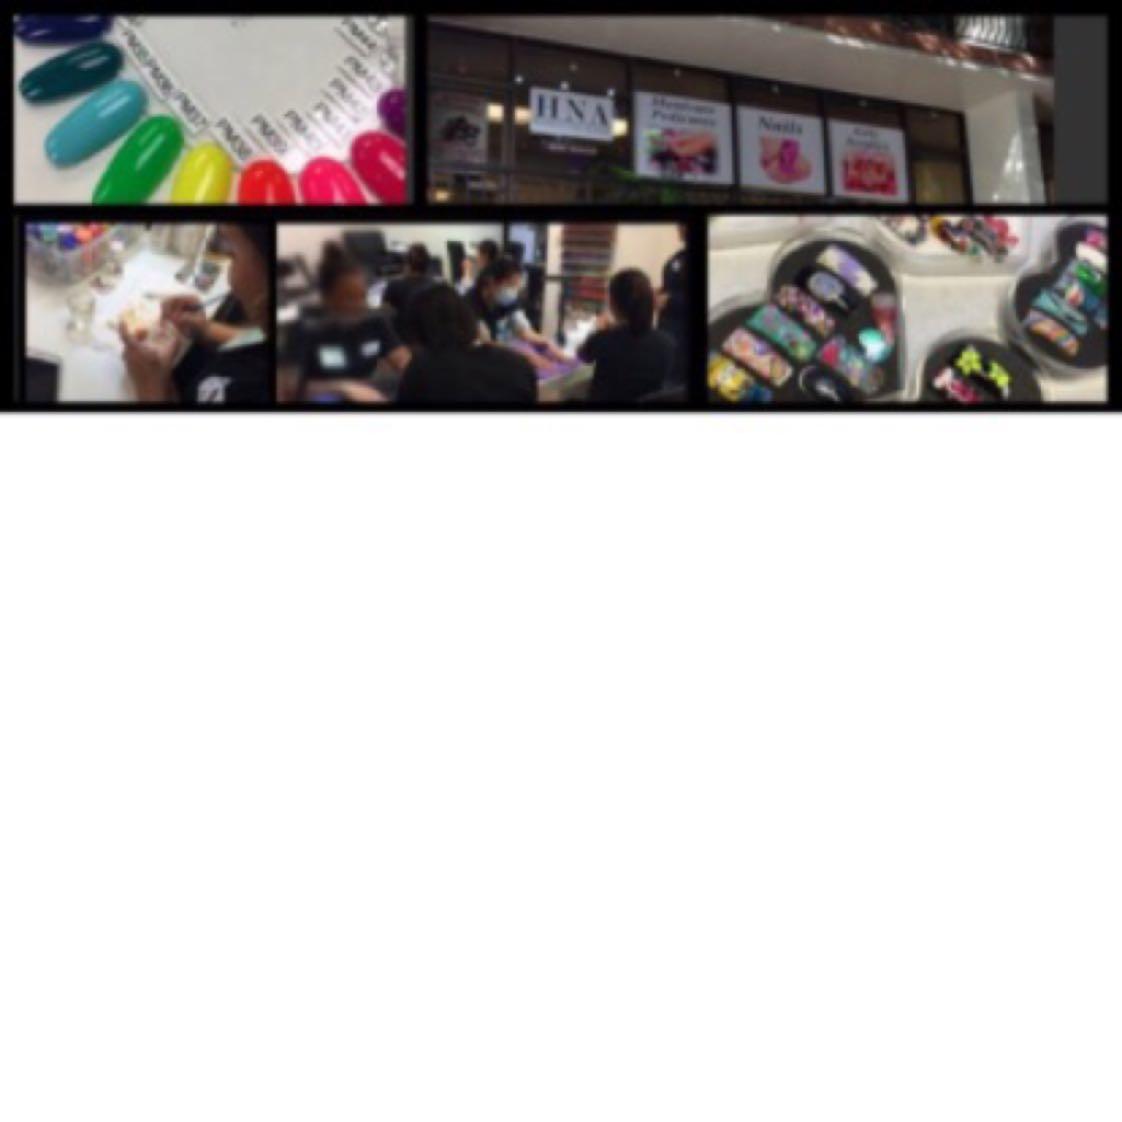 Honolulu Nails & Esthetics Academy (ネイル&エステ) image 10